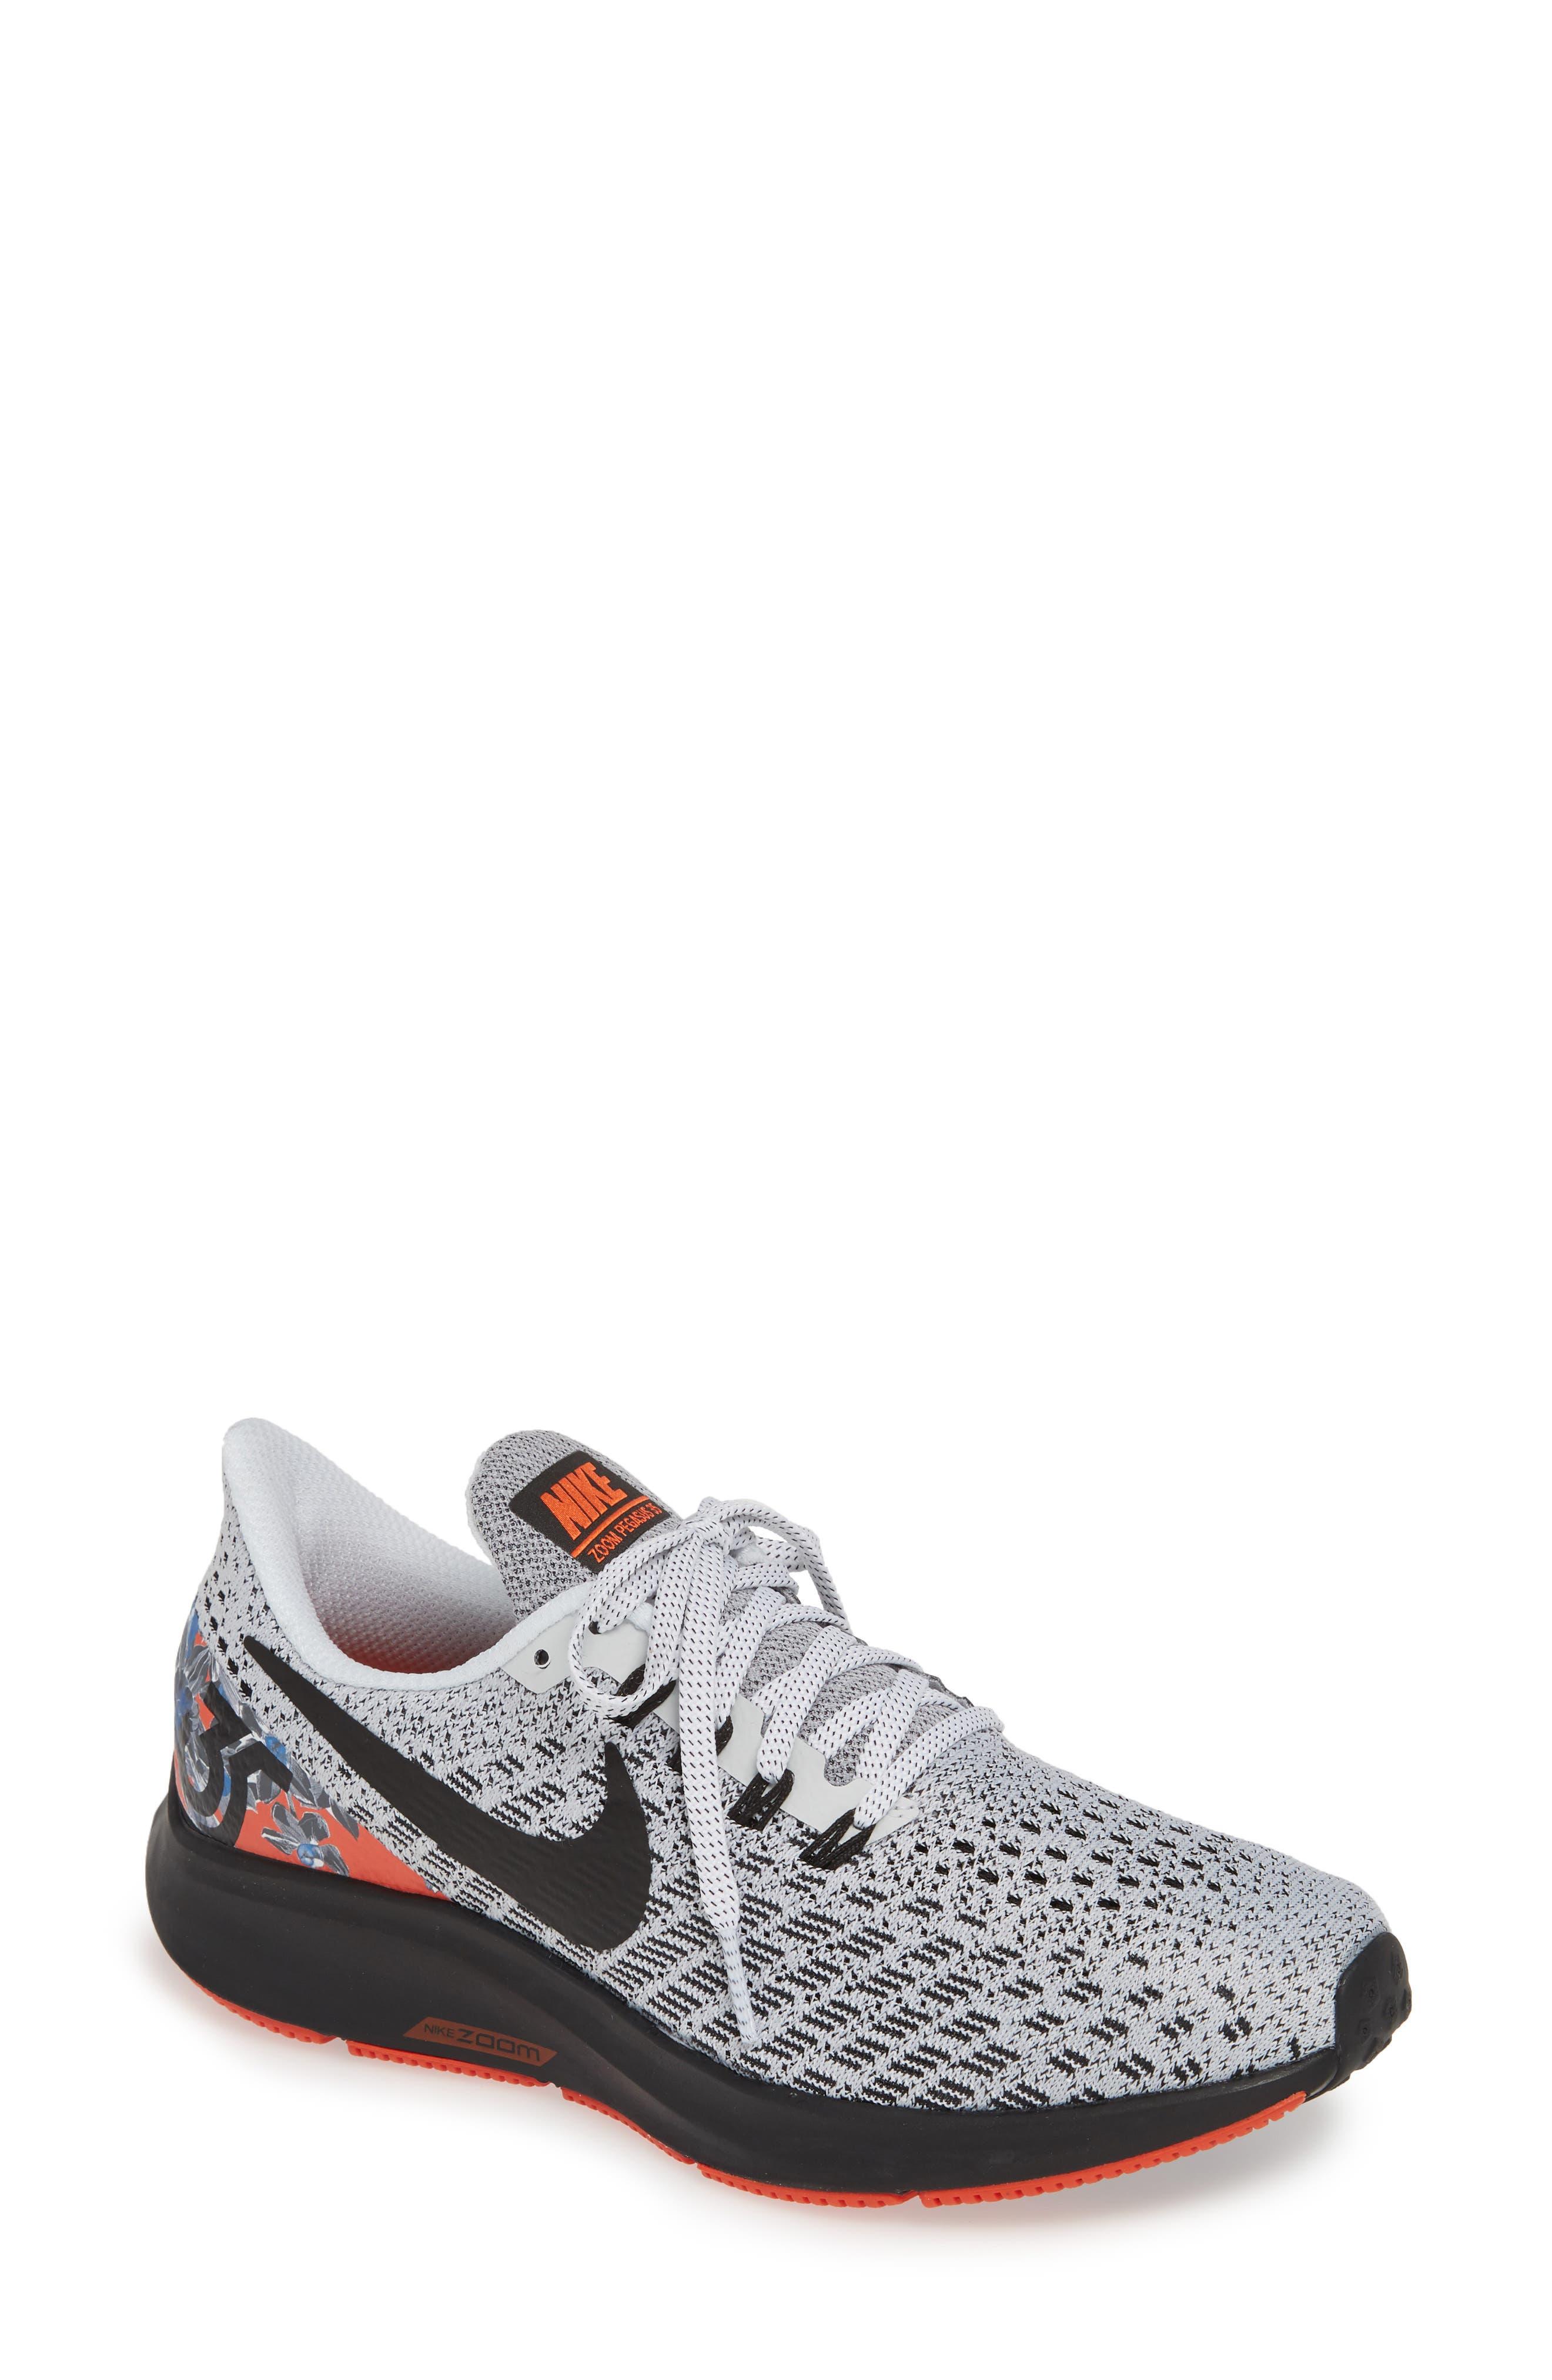 275ed6bf5e56 Women s Nike Sale